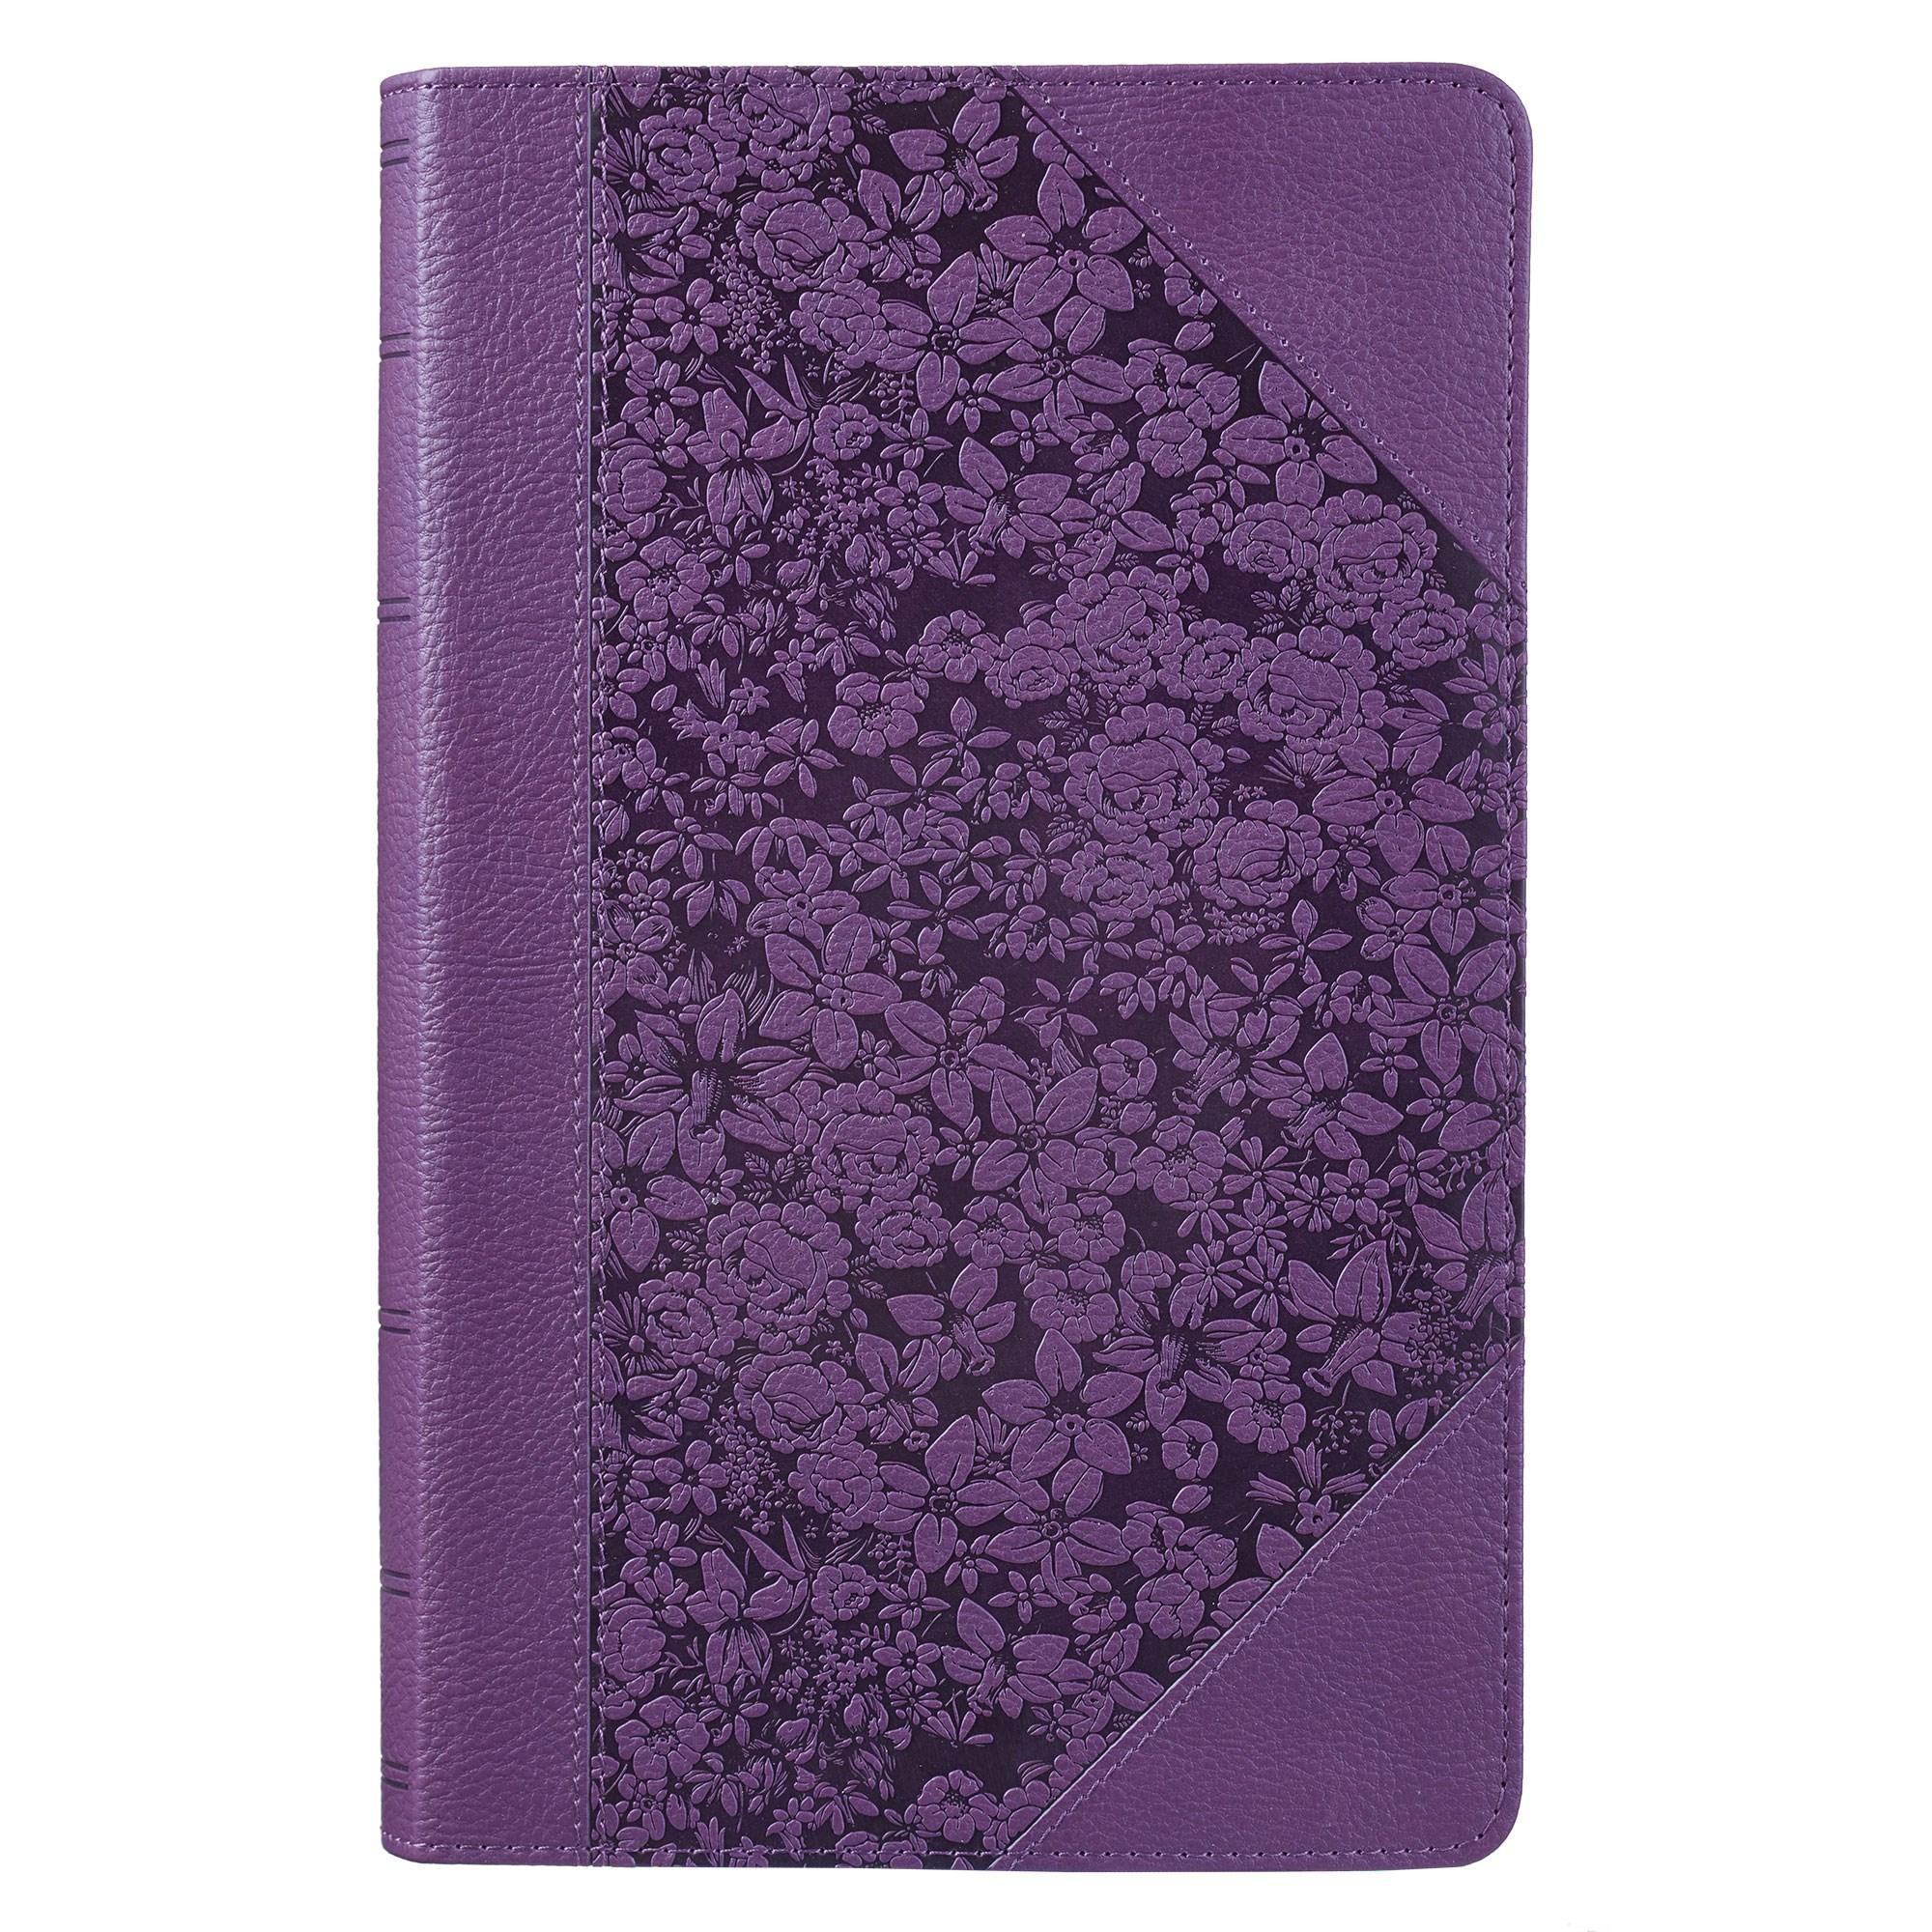 KJV Giant Print Bible-Purple Floral Portfolio LuxLeather